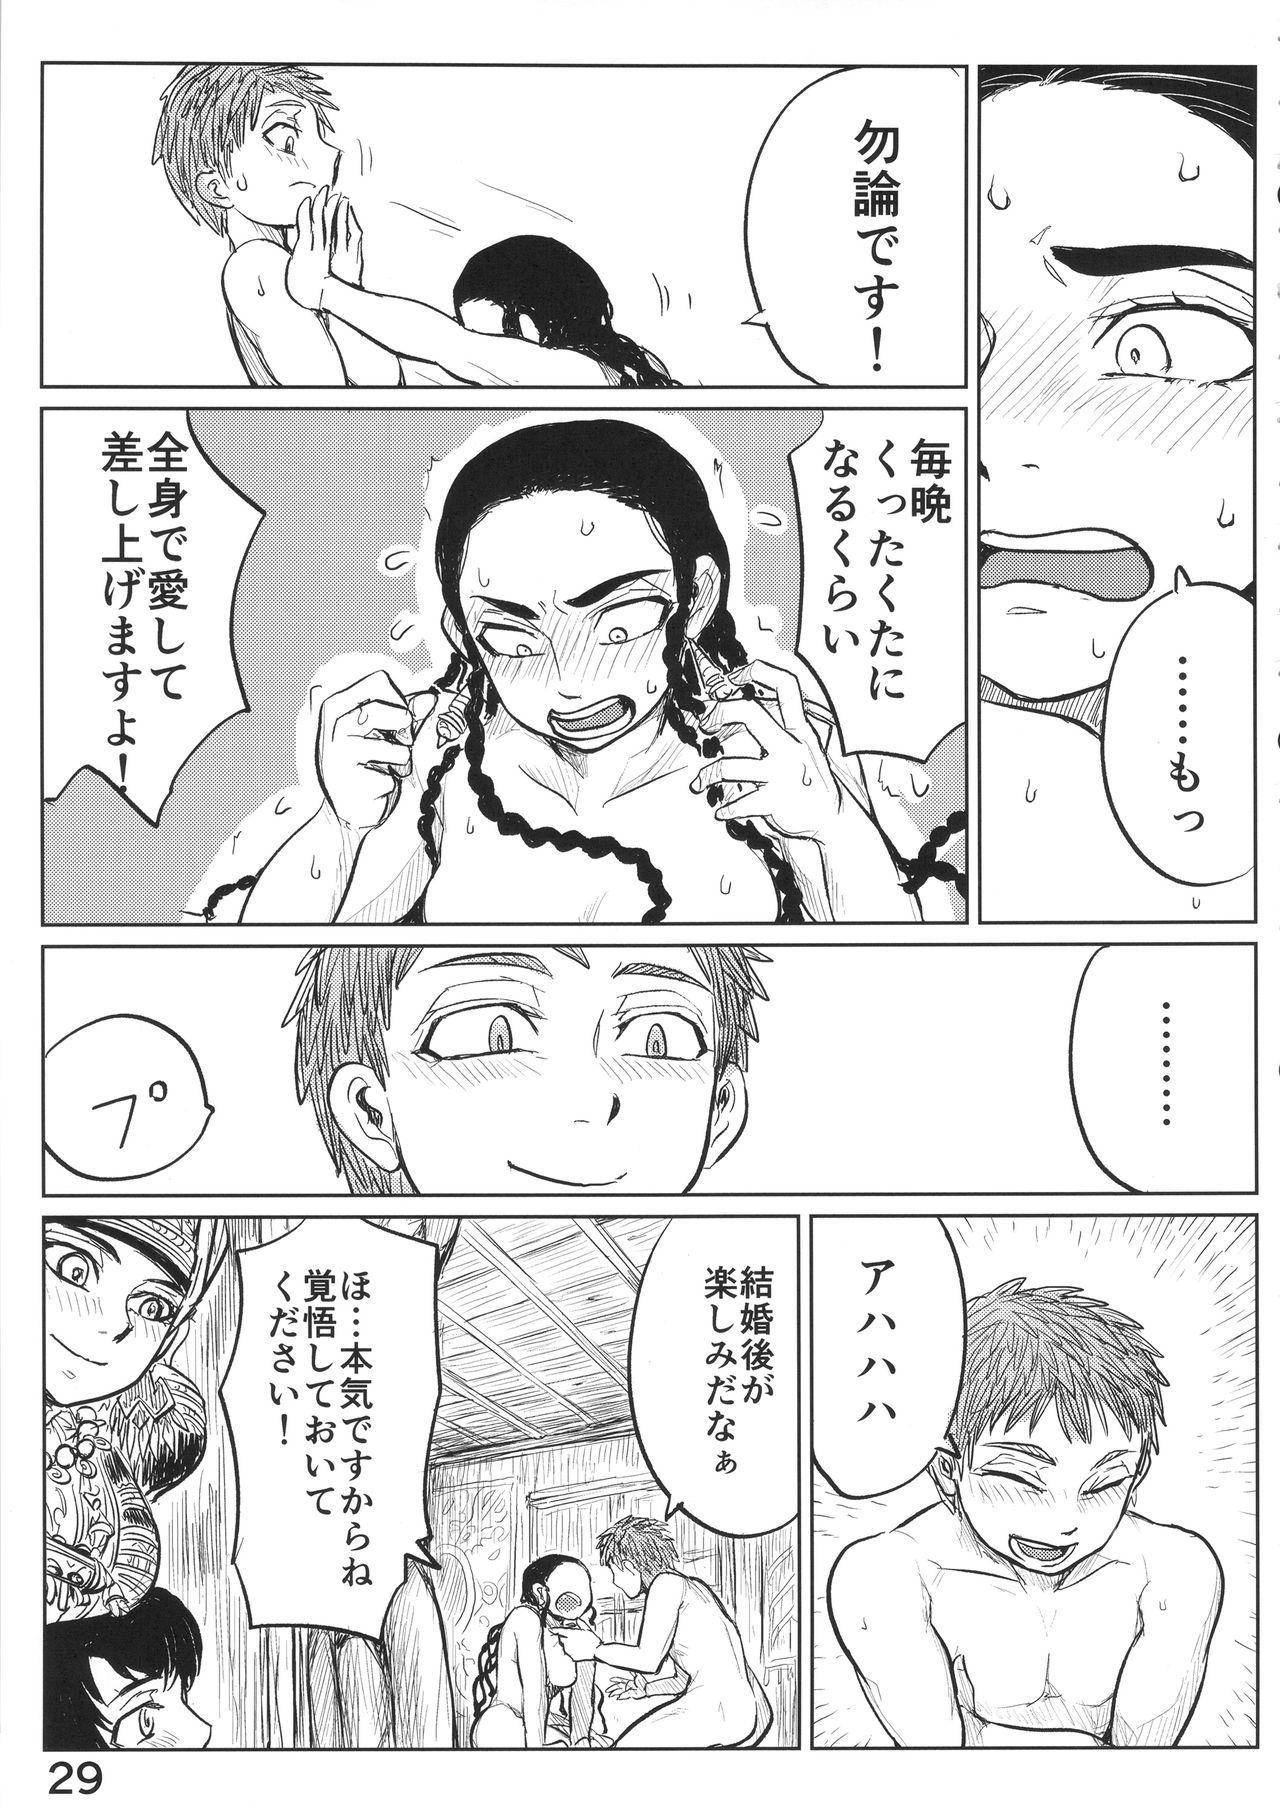 Yomedameshi 27